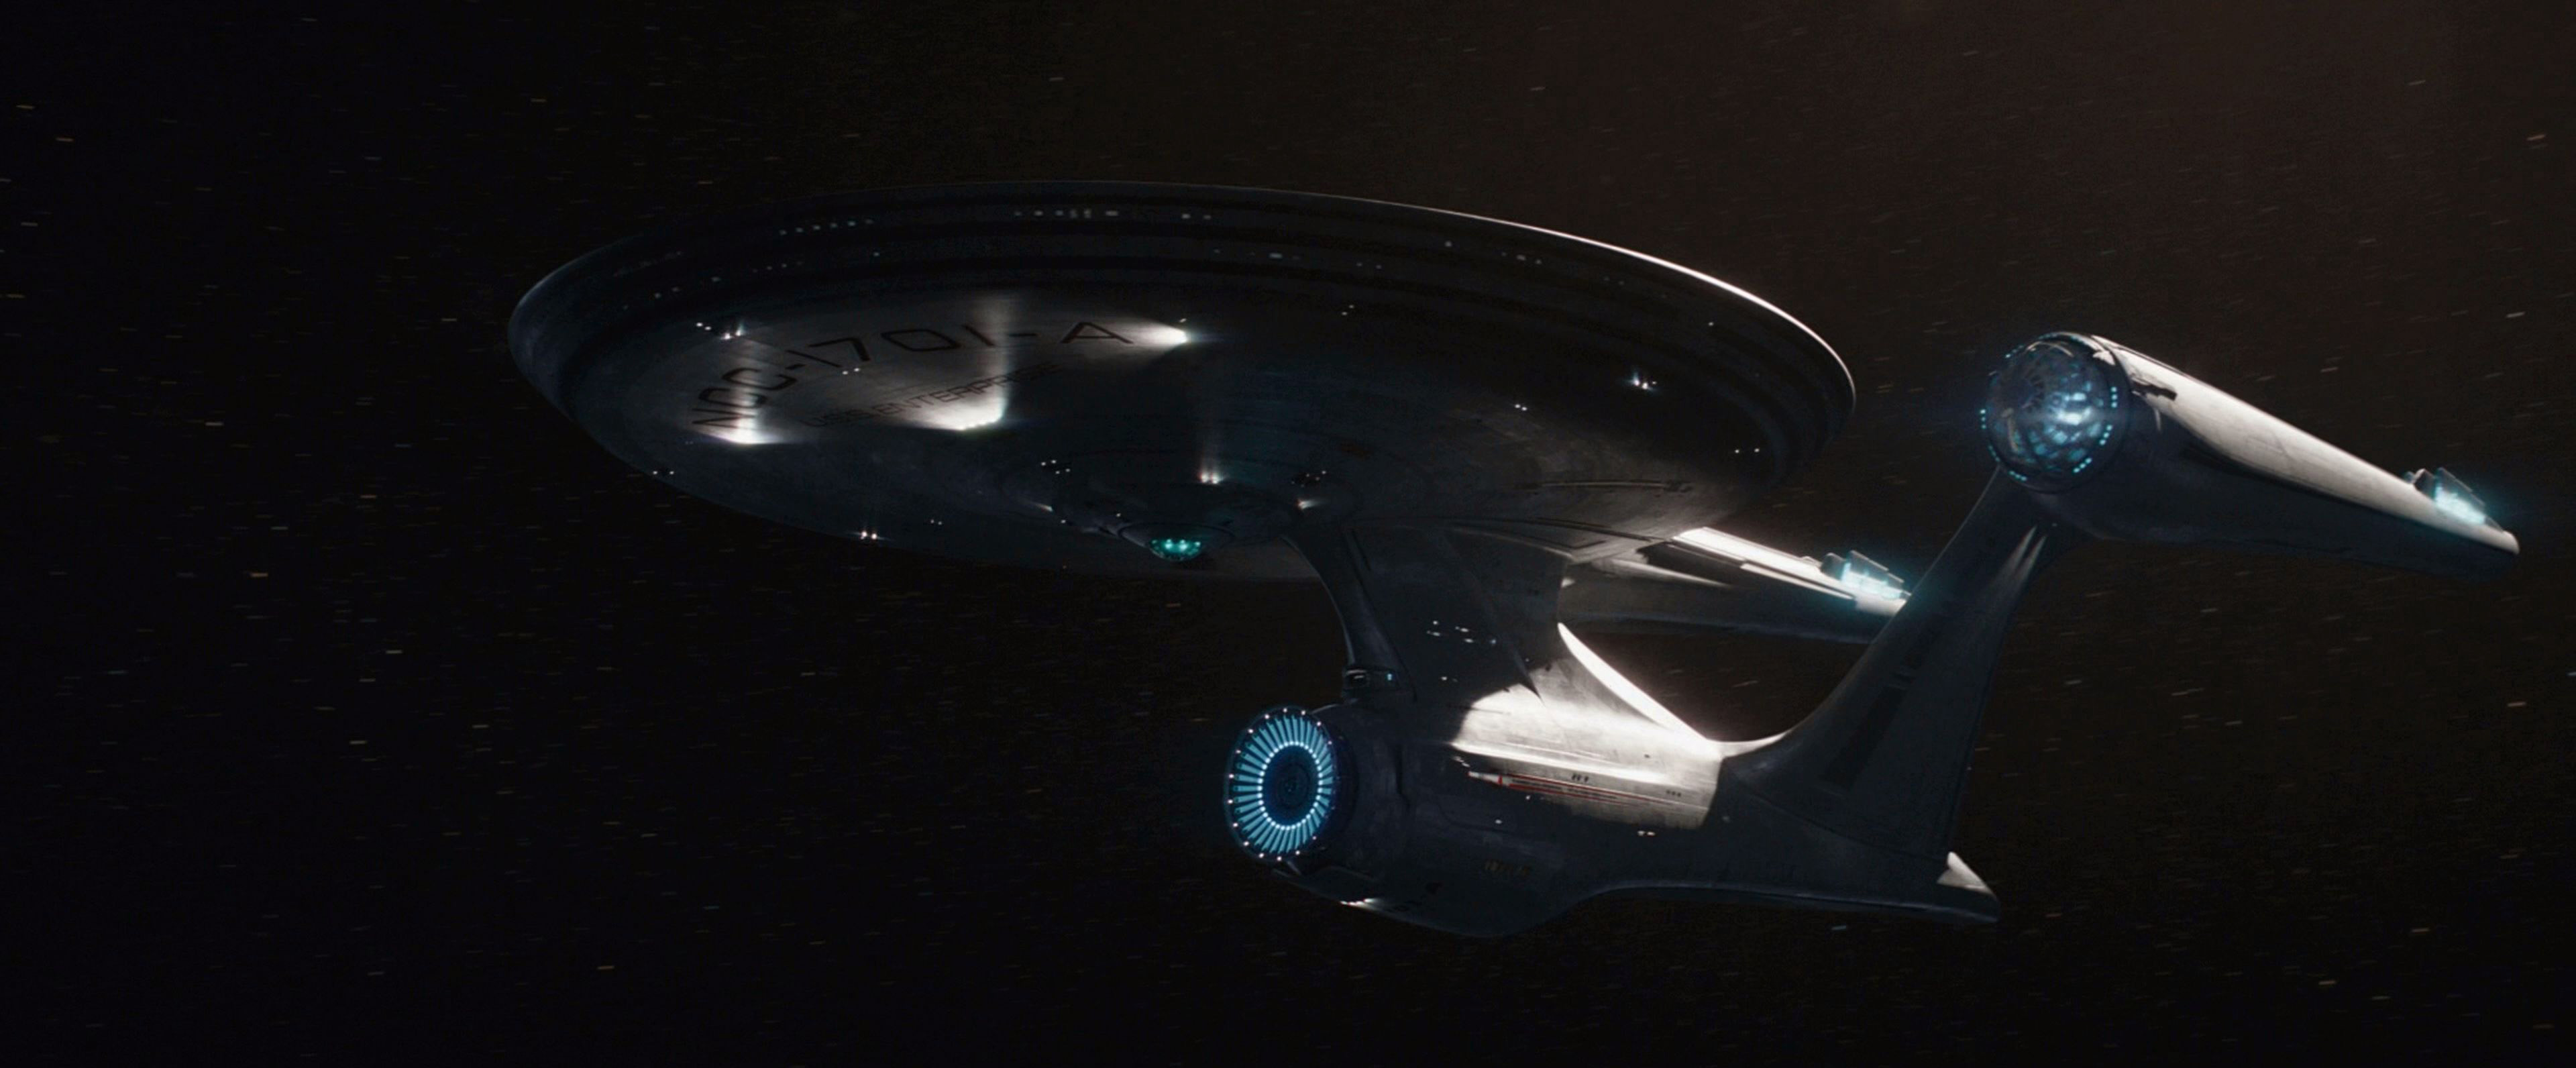 Uss Enterprise Ncc 1701 A Alternate Reality Memory Alpha Fandom